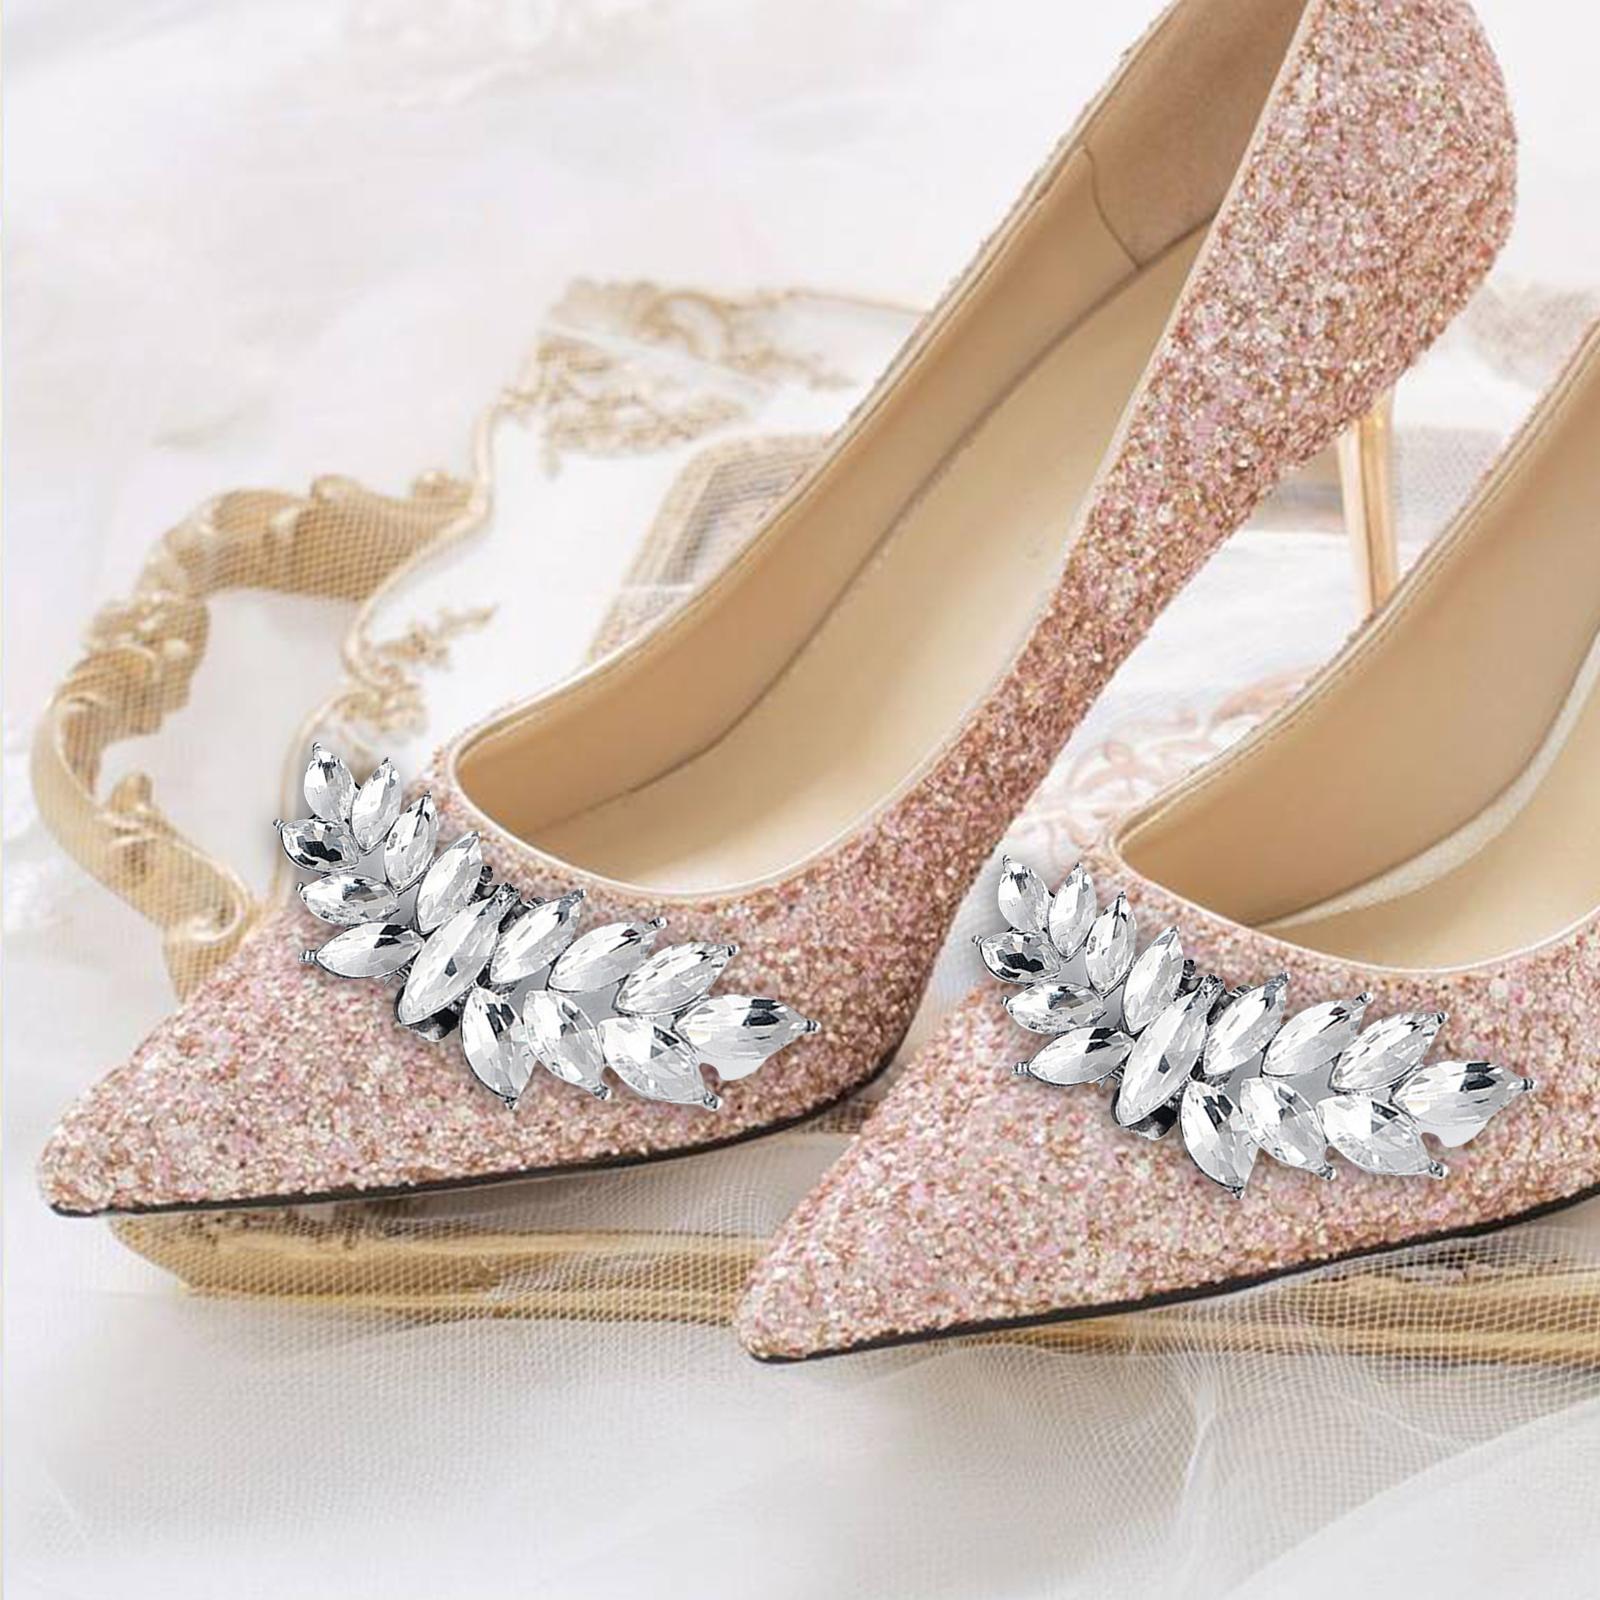 Rhinestone Bridal Shoe Clips Applique Patch Glittering Shoe Buckle Embellishment